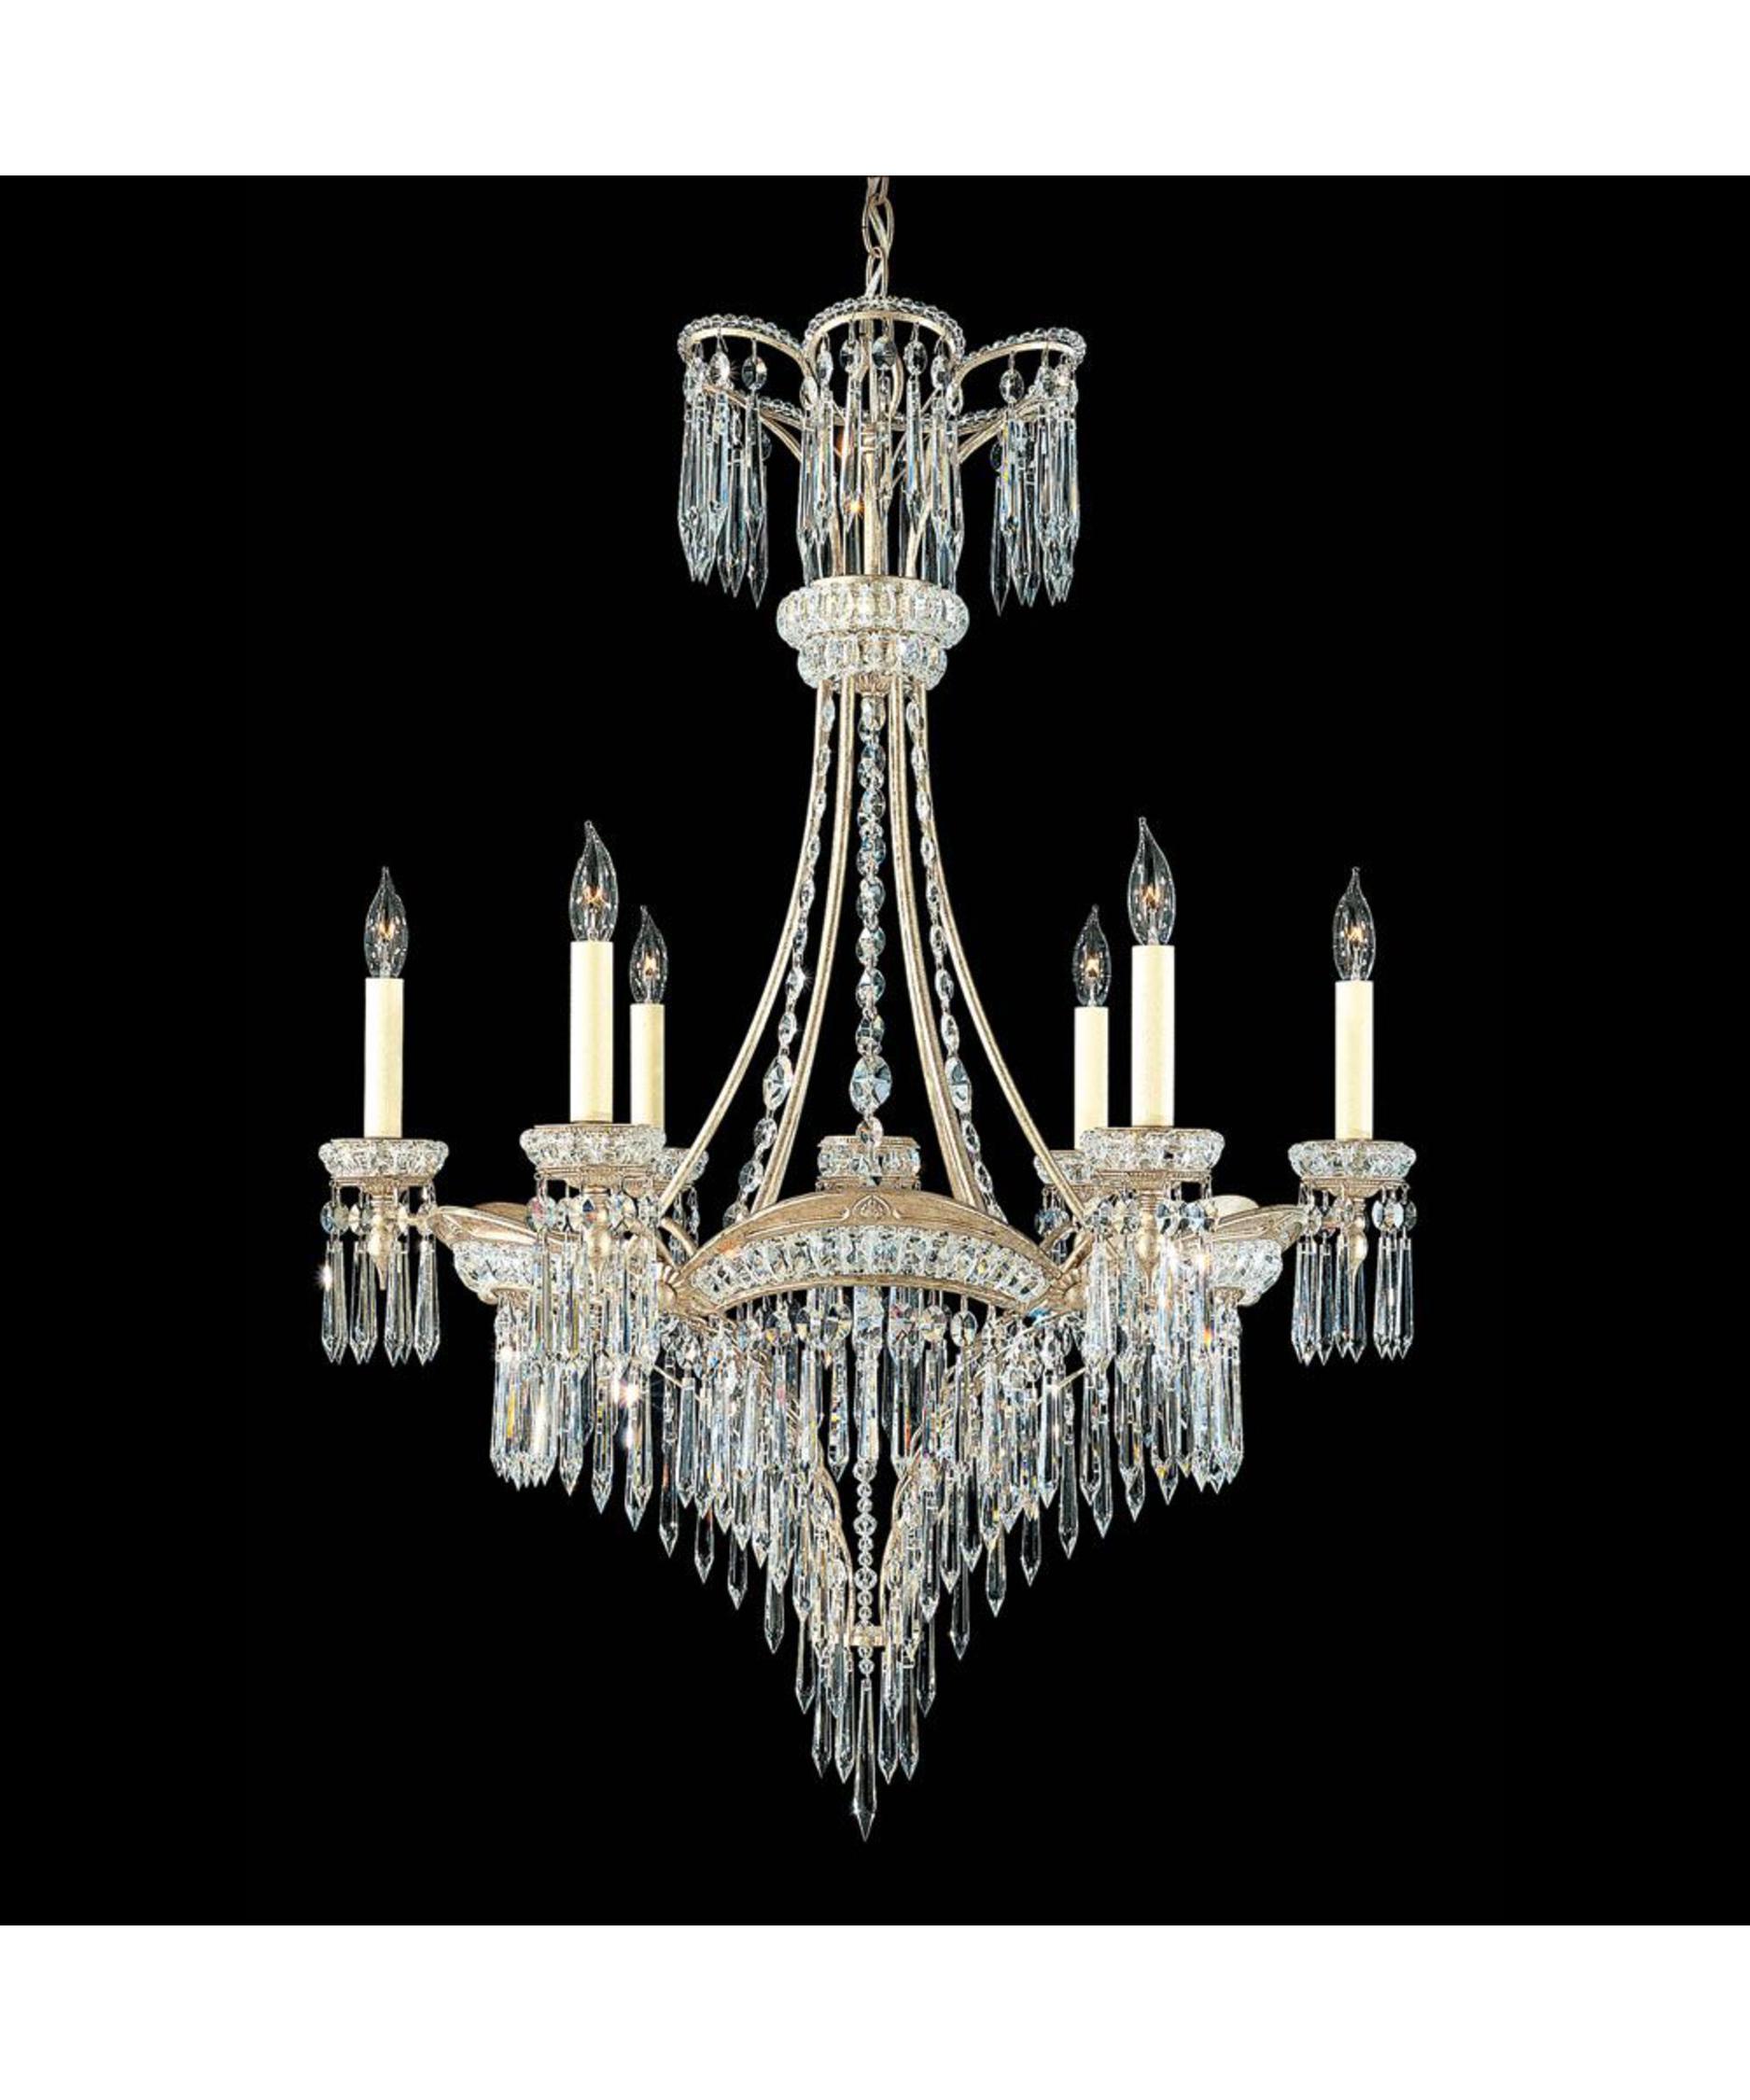 Schonbek Victorian 27 Inch Wide 6 Light Chandelier – Victorian Chandelier